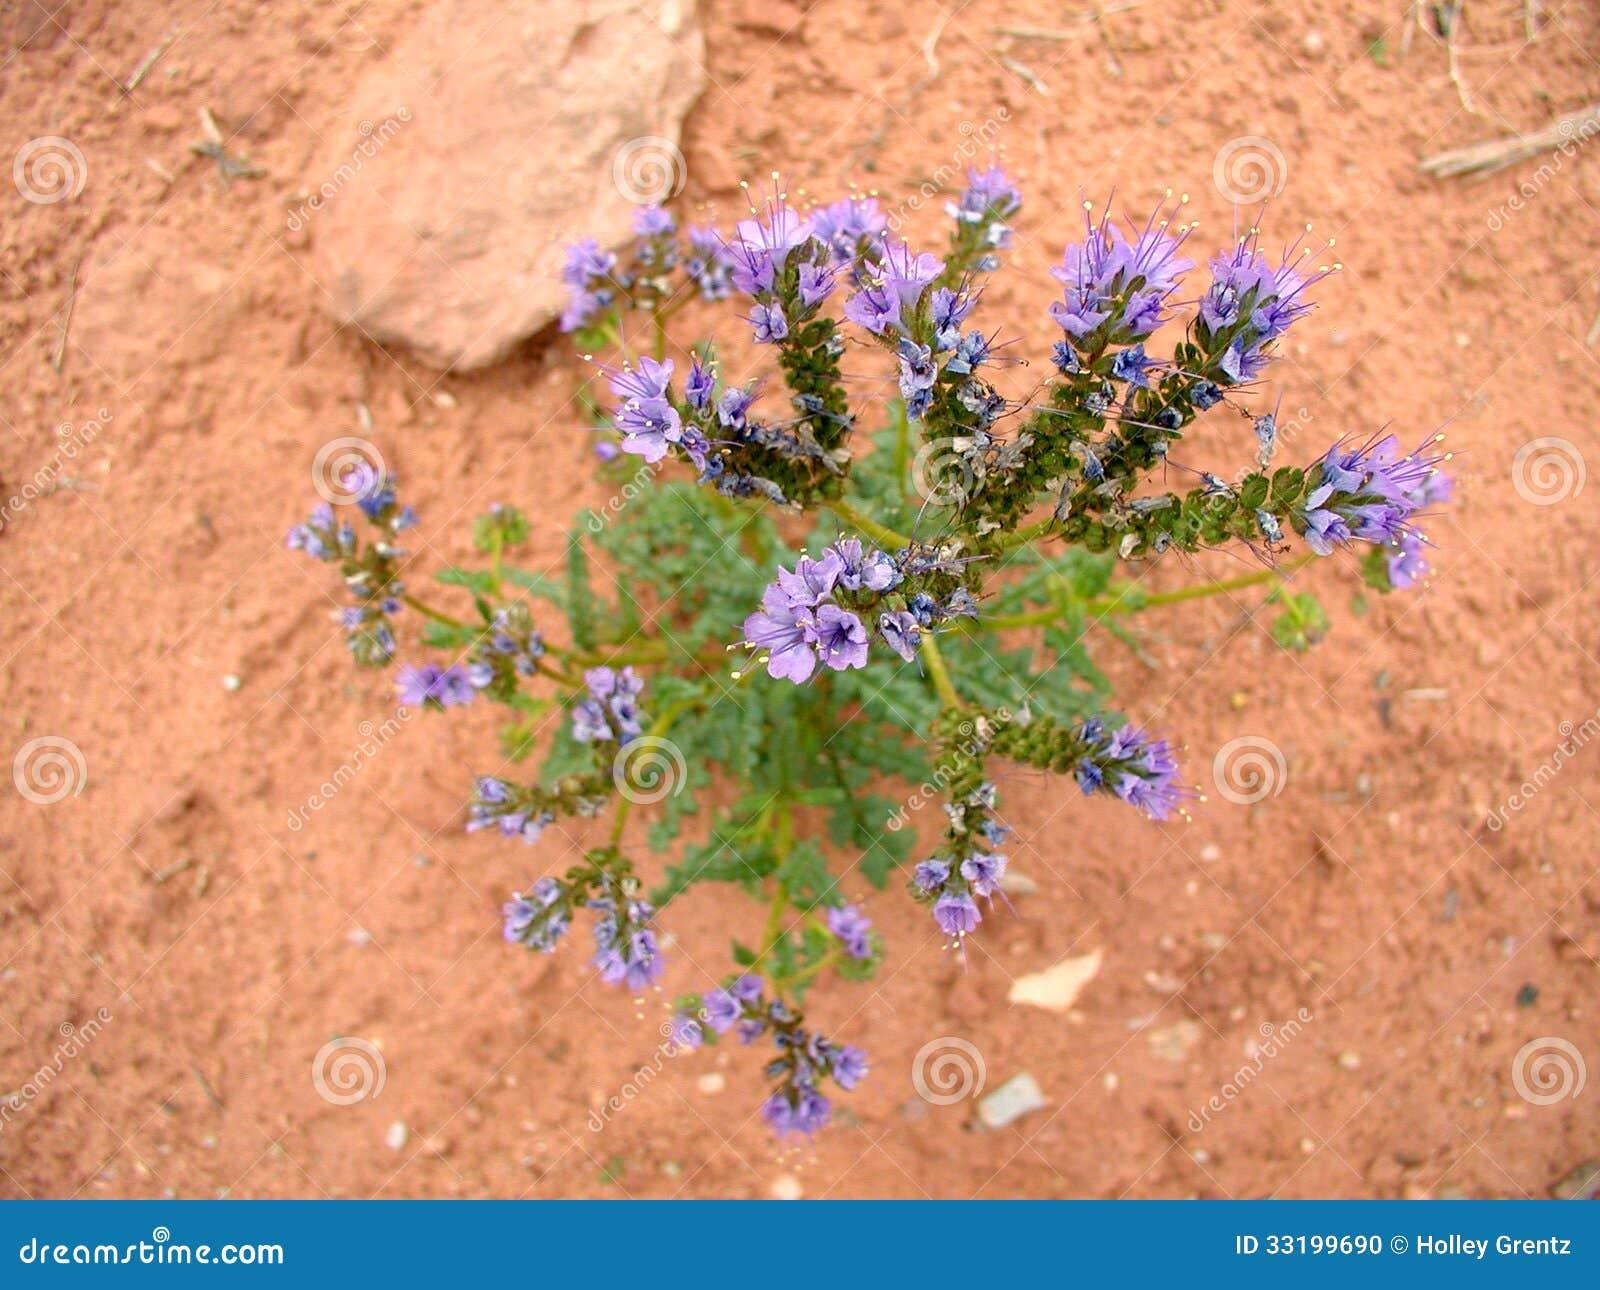 purple desert flower stock photo image 33199690